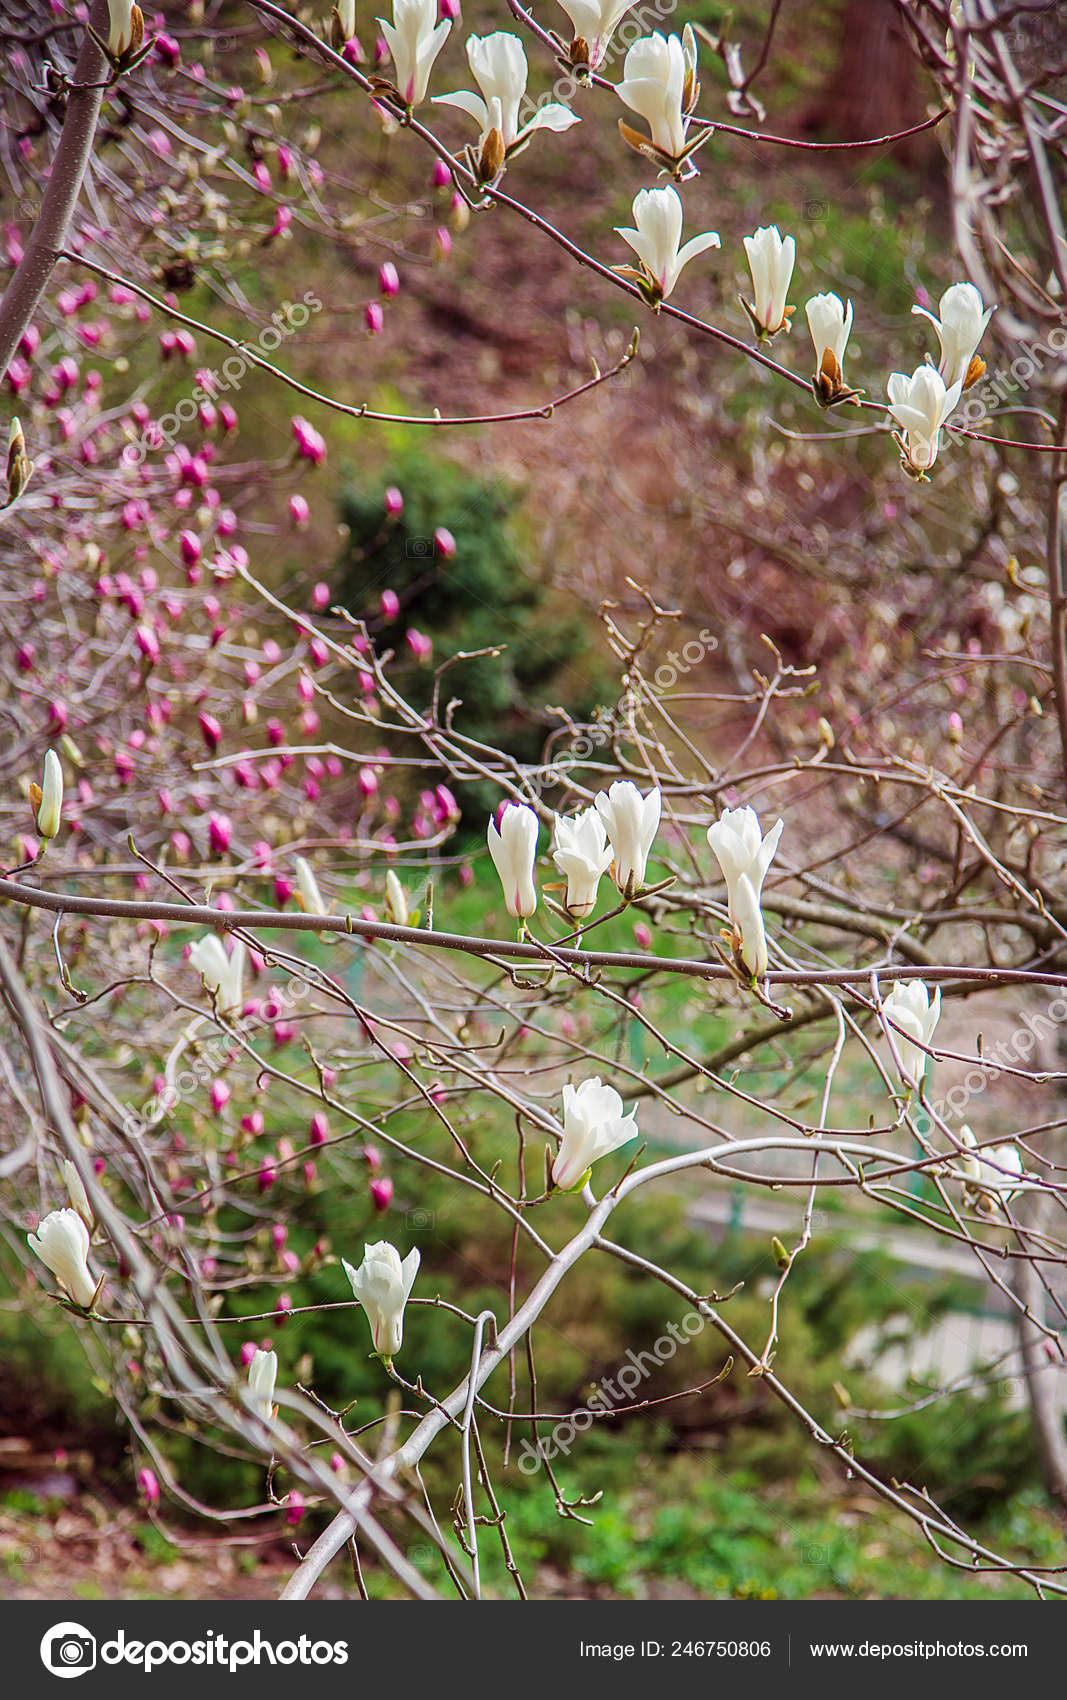 Large Pink White Magnolia Trees Bloom Park Spring Day Floral Stock Photo C Liubovyashkir 246750806